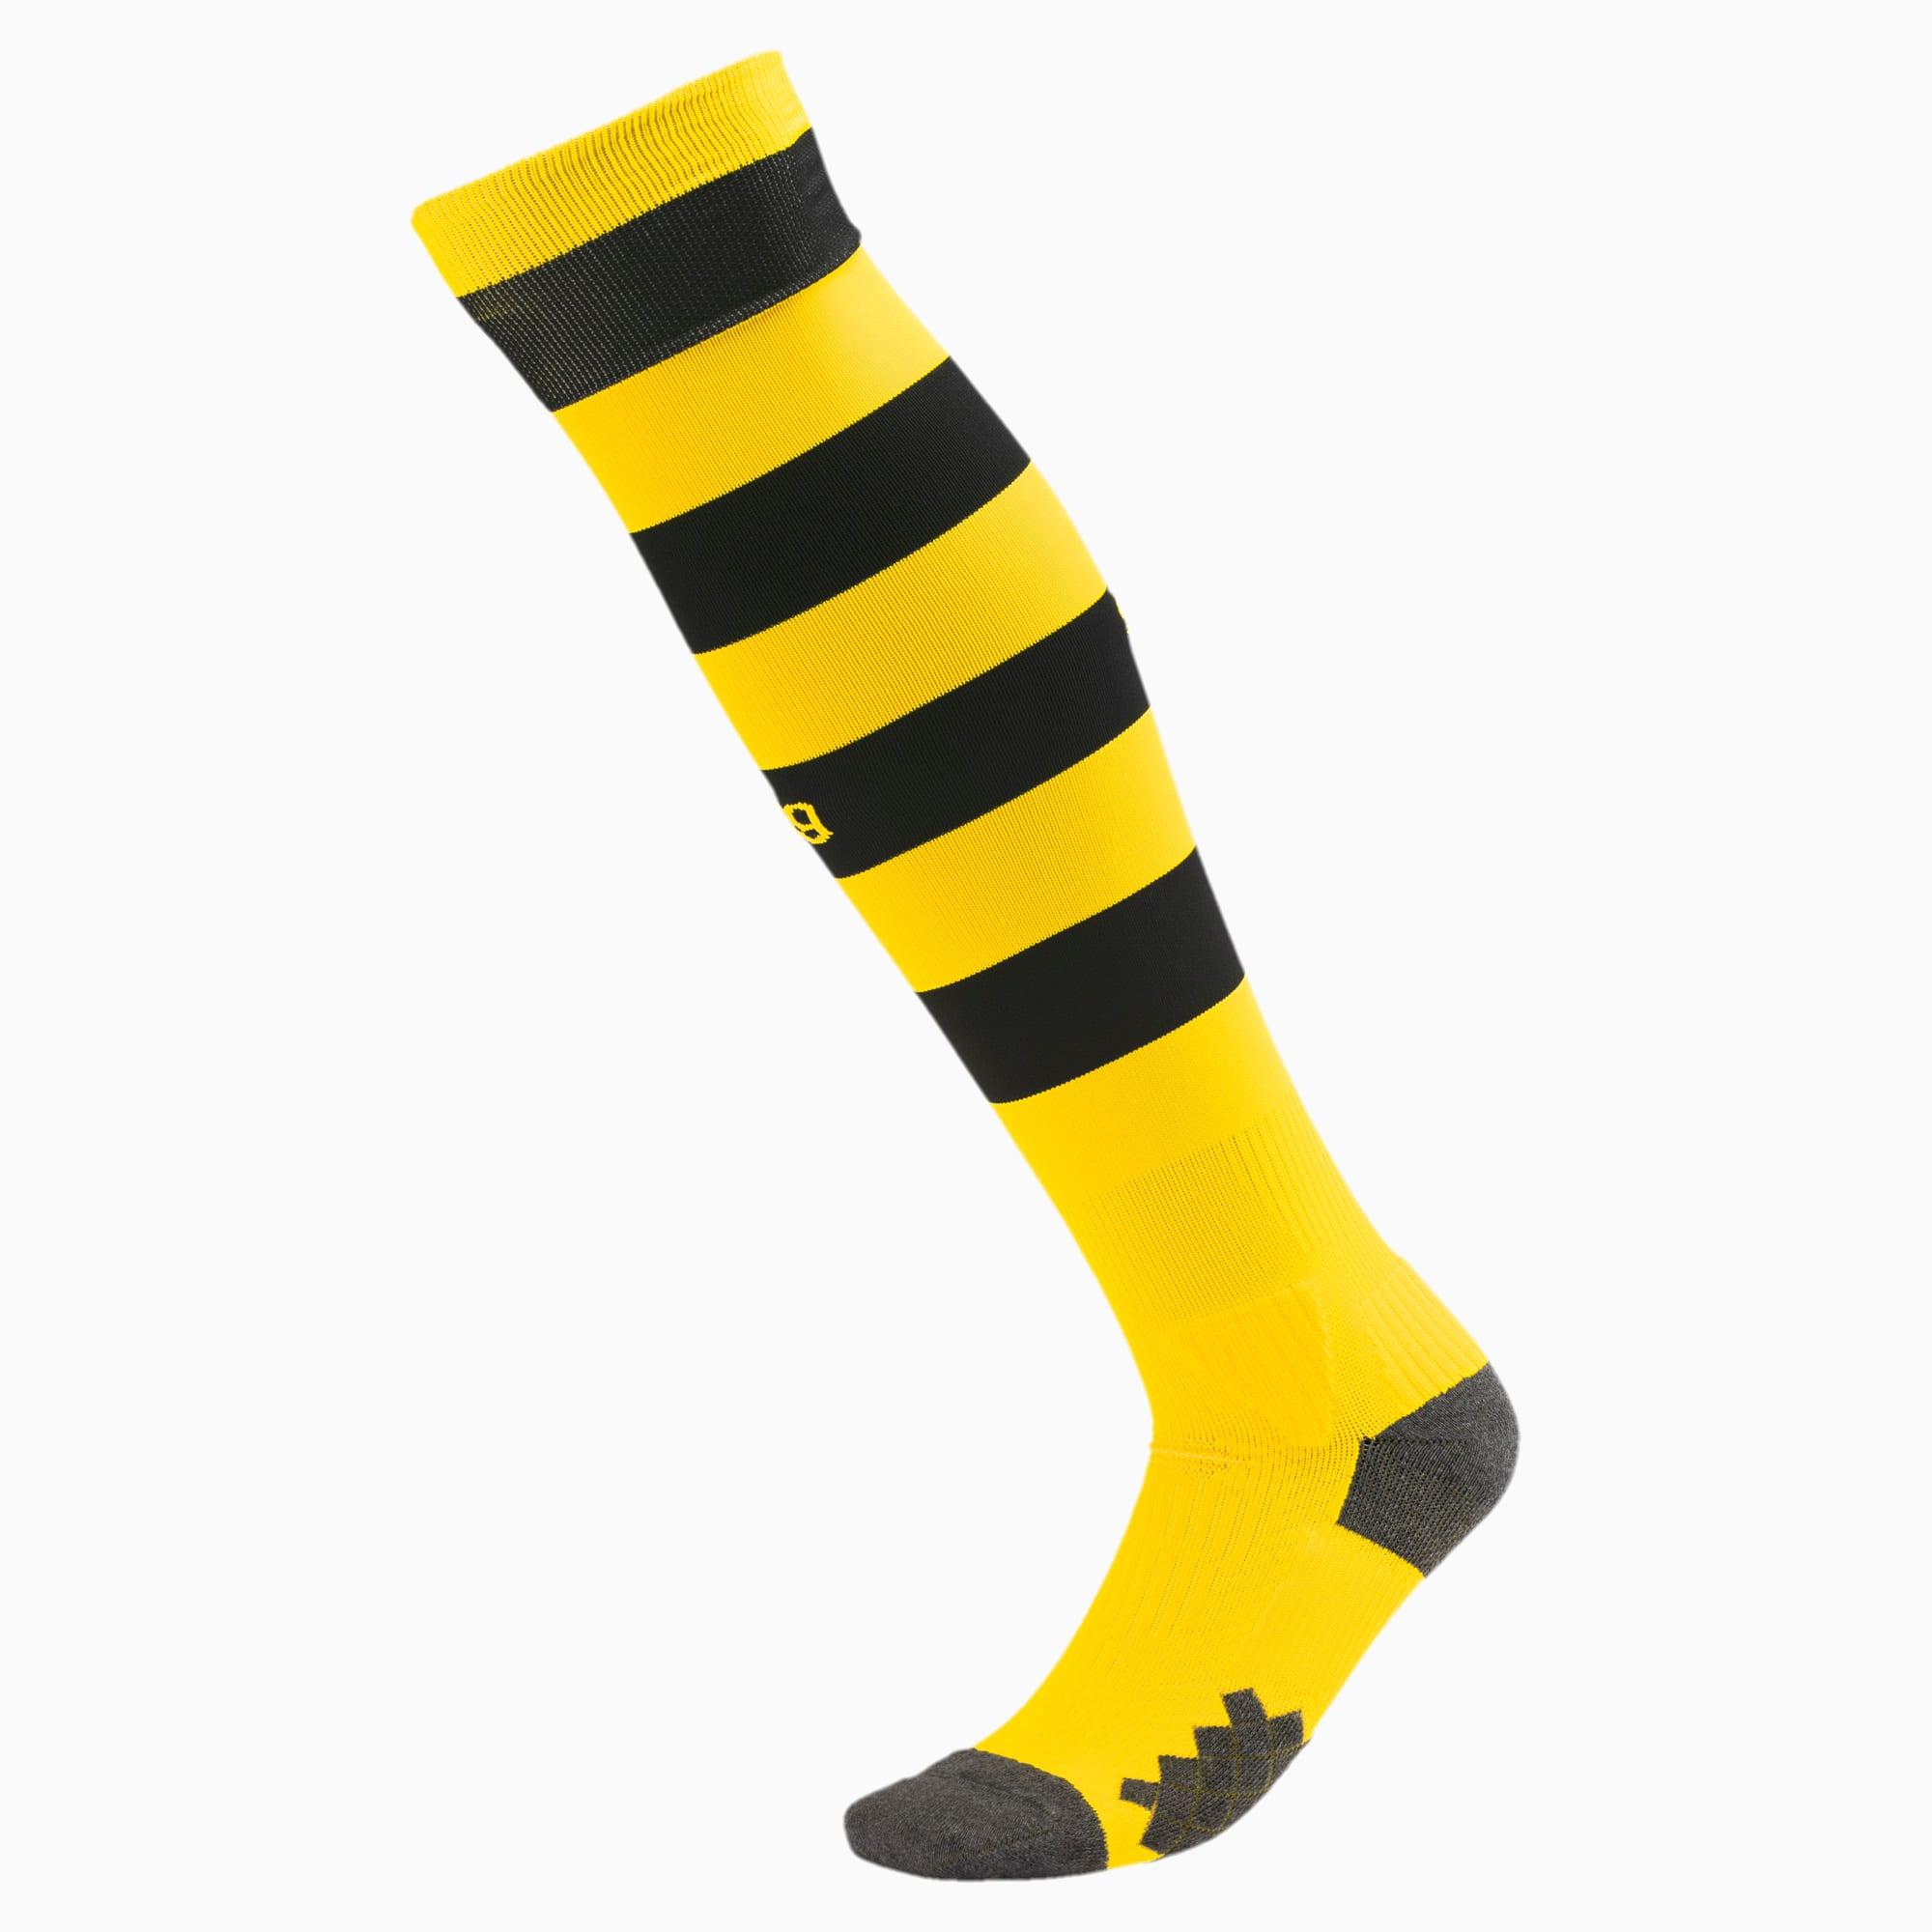 PUMA Chaussure Chaussettes rayées BVB pour Homme, Jaune/Noir, Taille 43-46, Chaussures